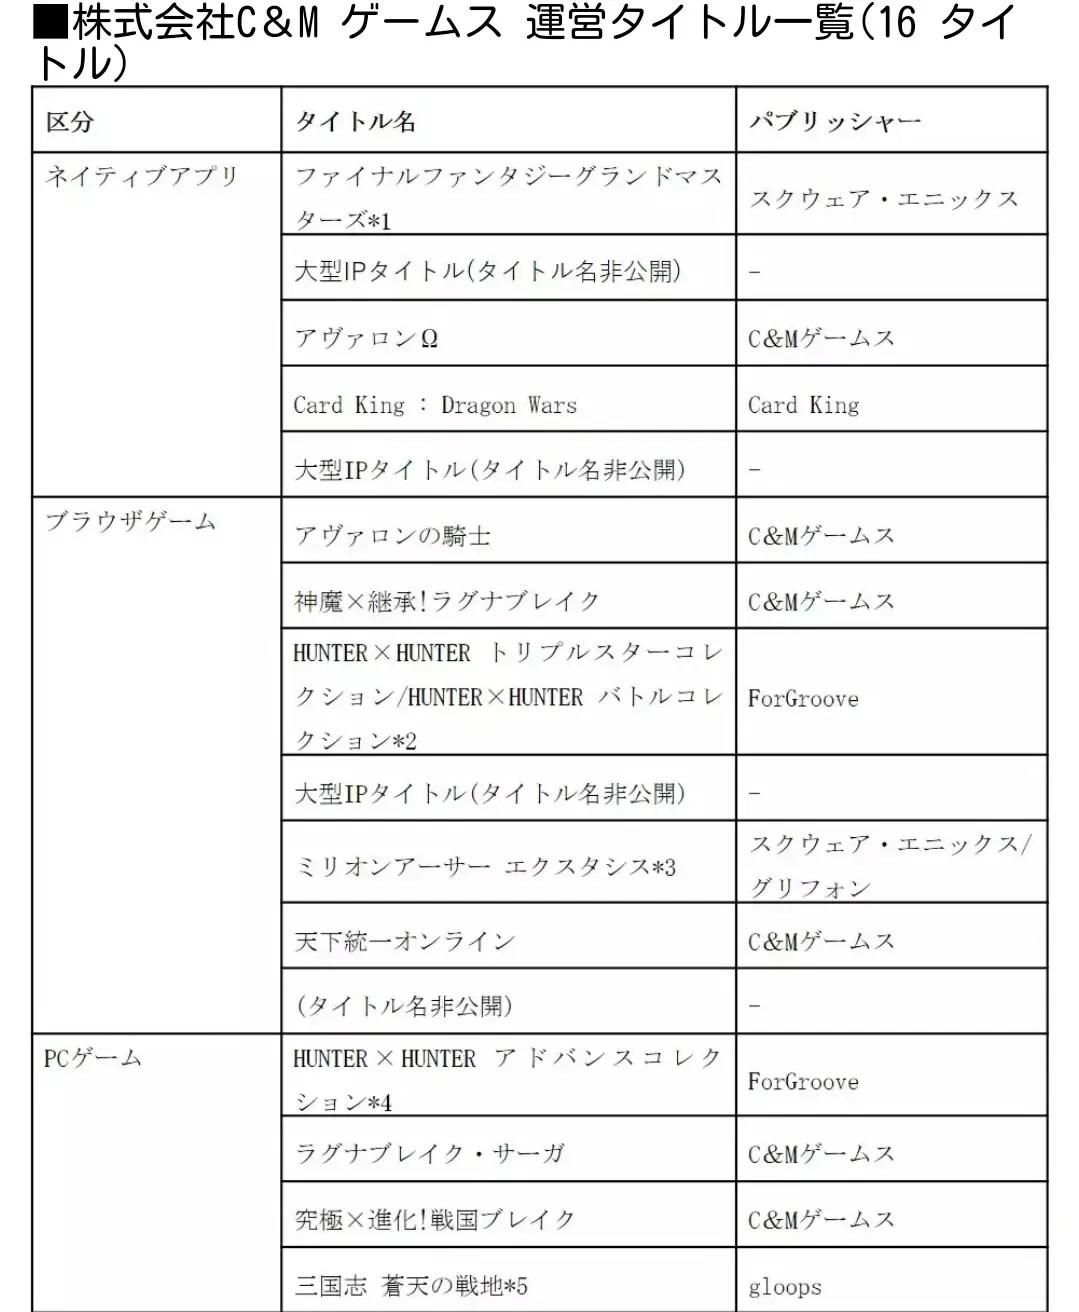 screenshot_2016-10-13-21-03-07-01